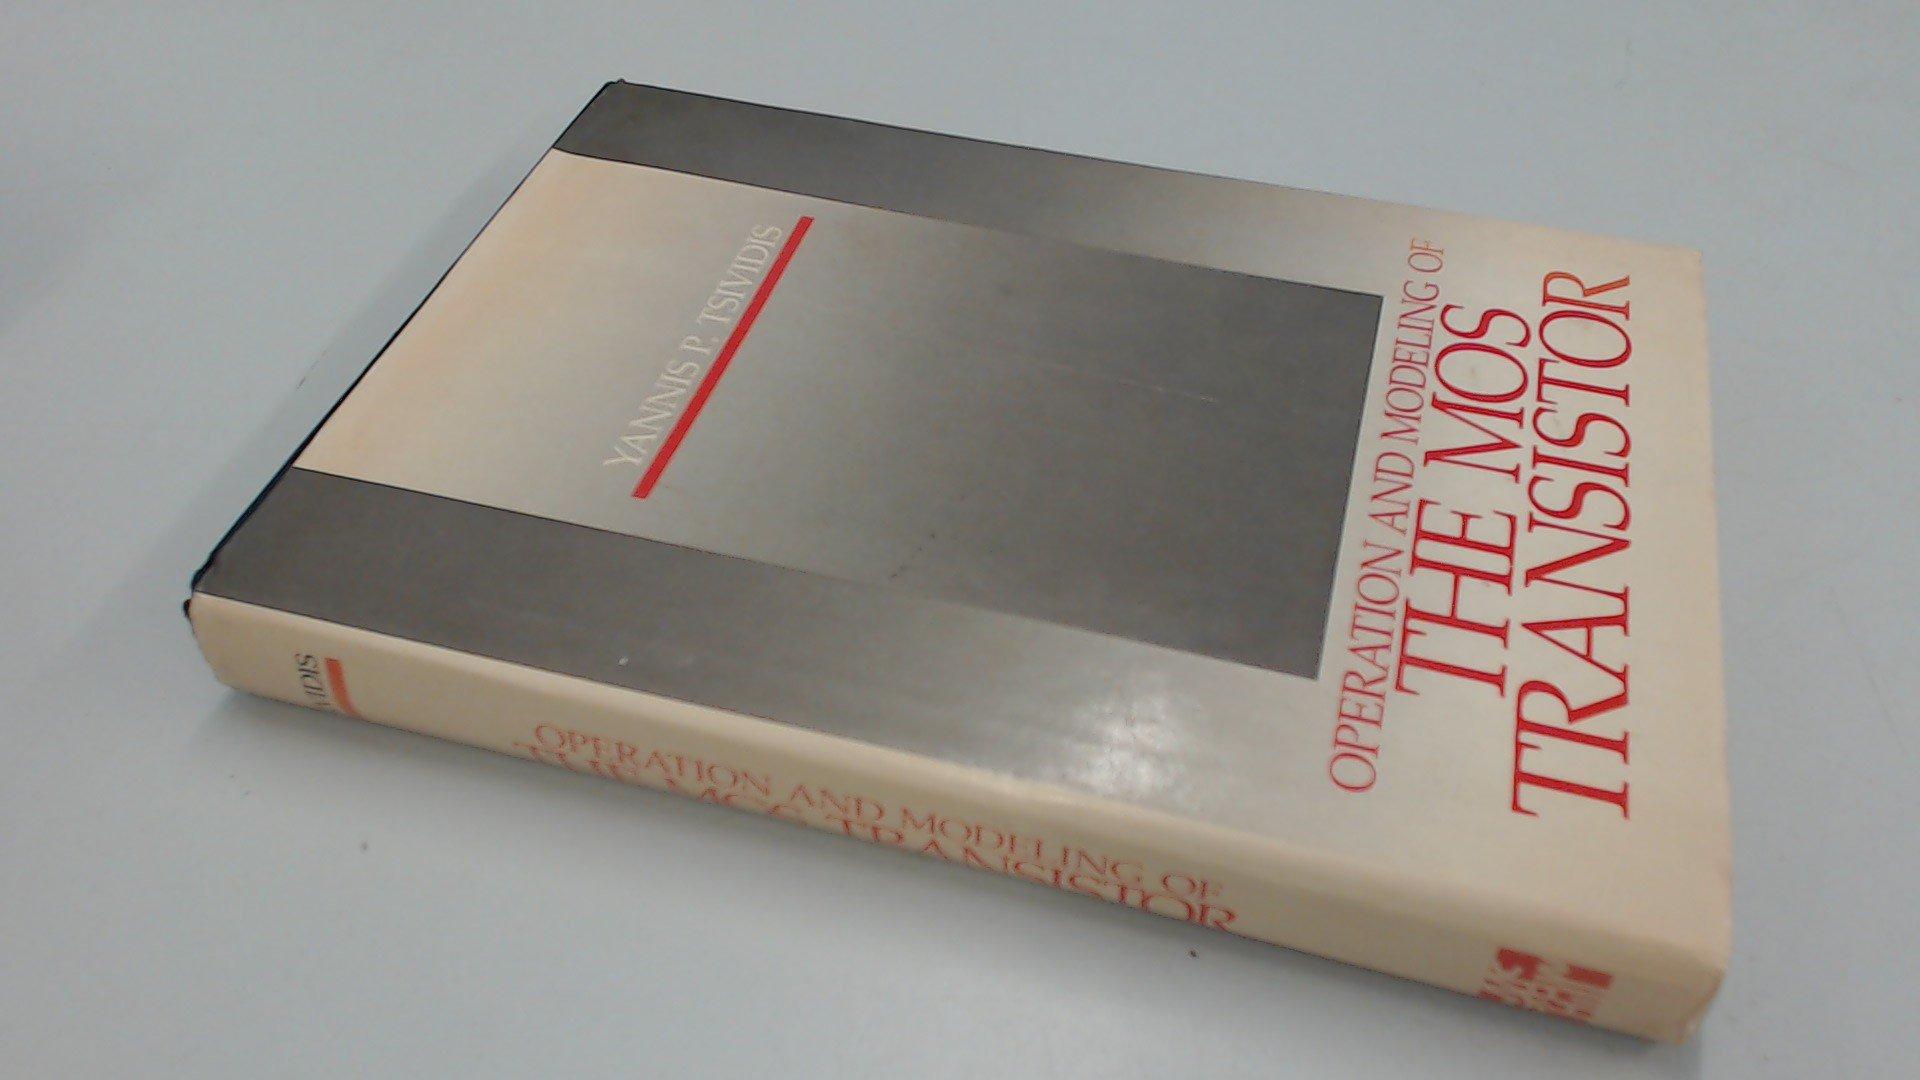 Operation And Modeling Of The Mos Transistor Yannis P Tsividis Transistors 9780070653818 Books